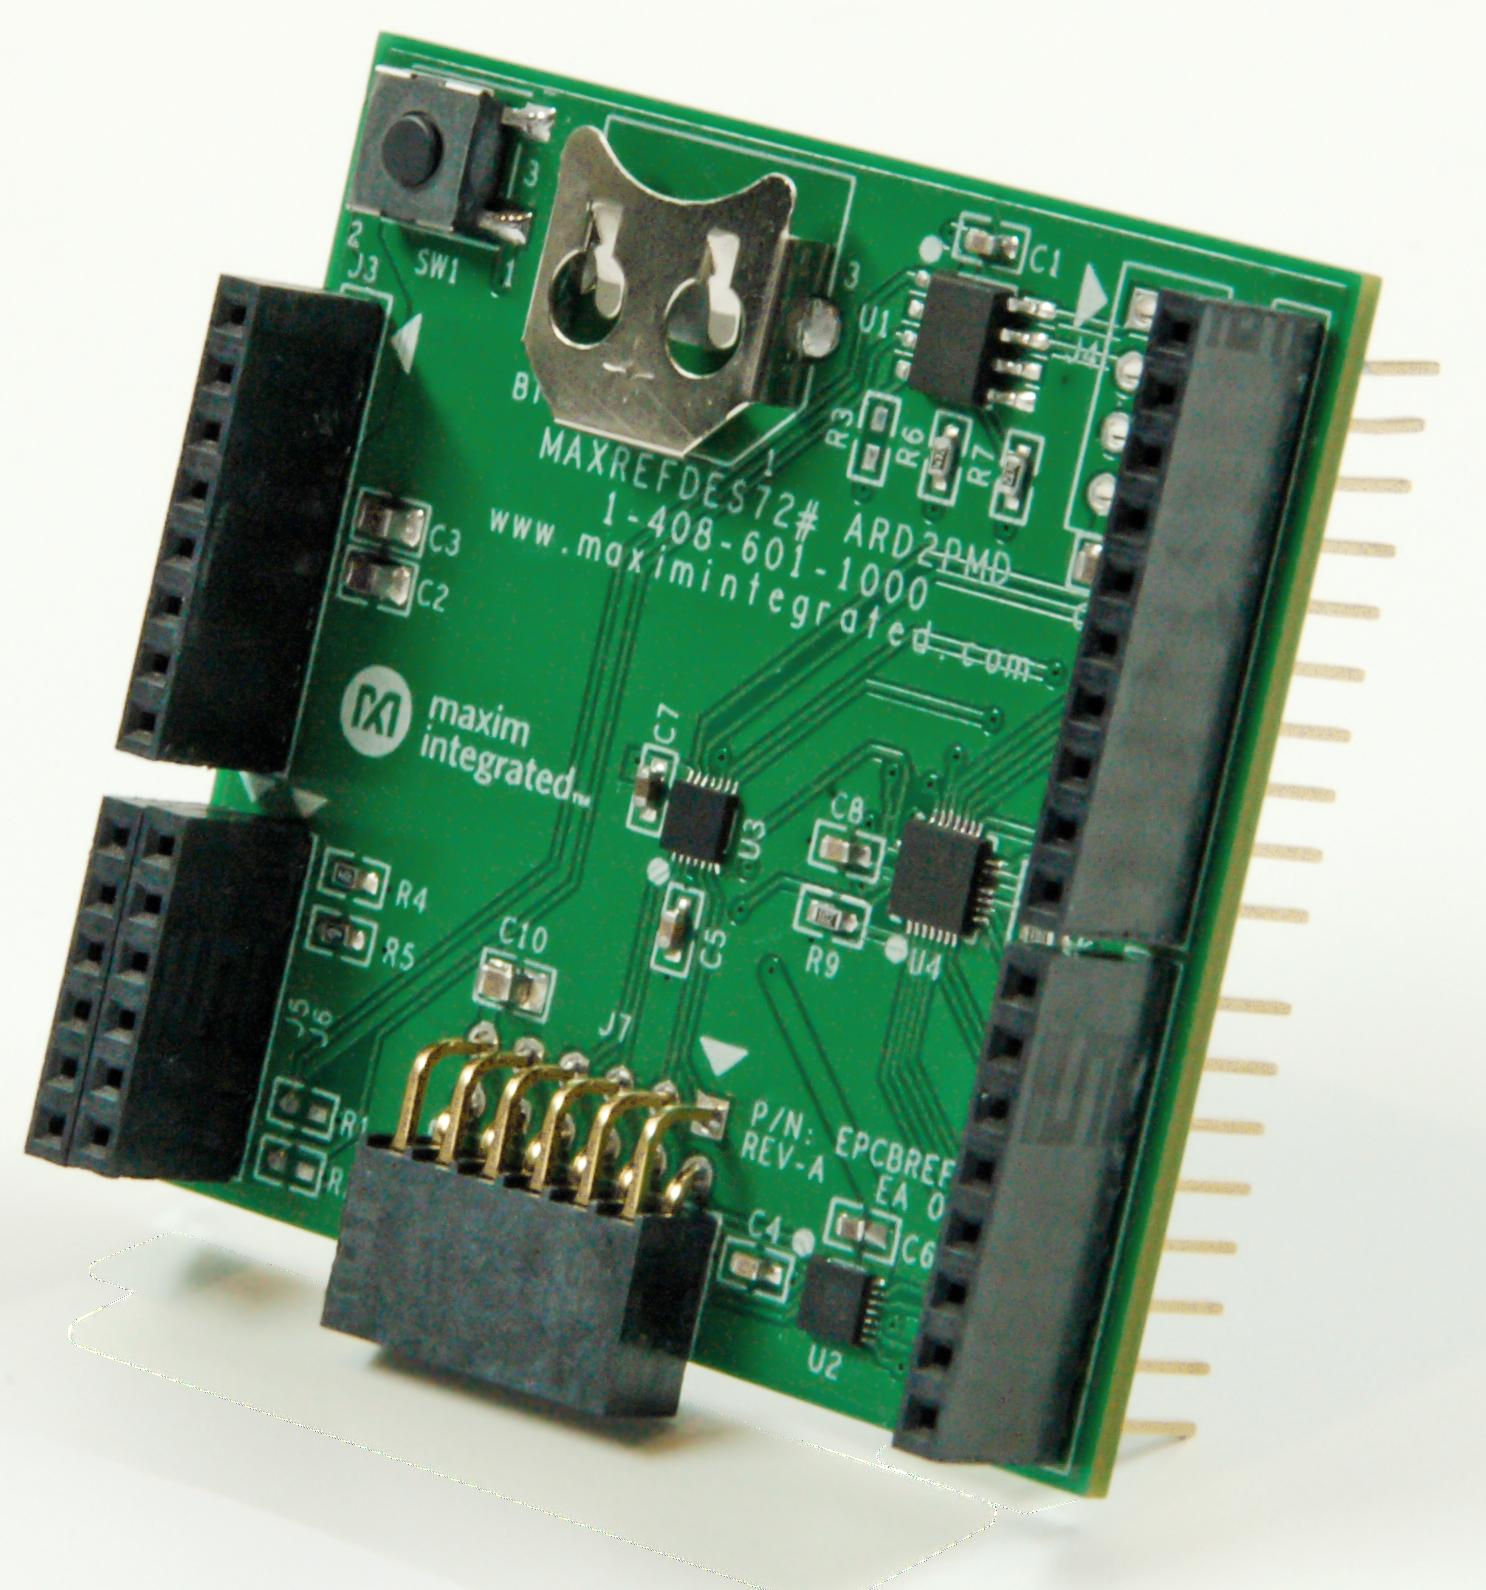 Maxrefdes72 Pmod Adapter For Arduino Platform How To Make Custom Shields A Microcontroller Board